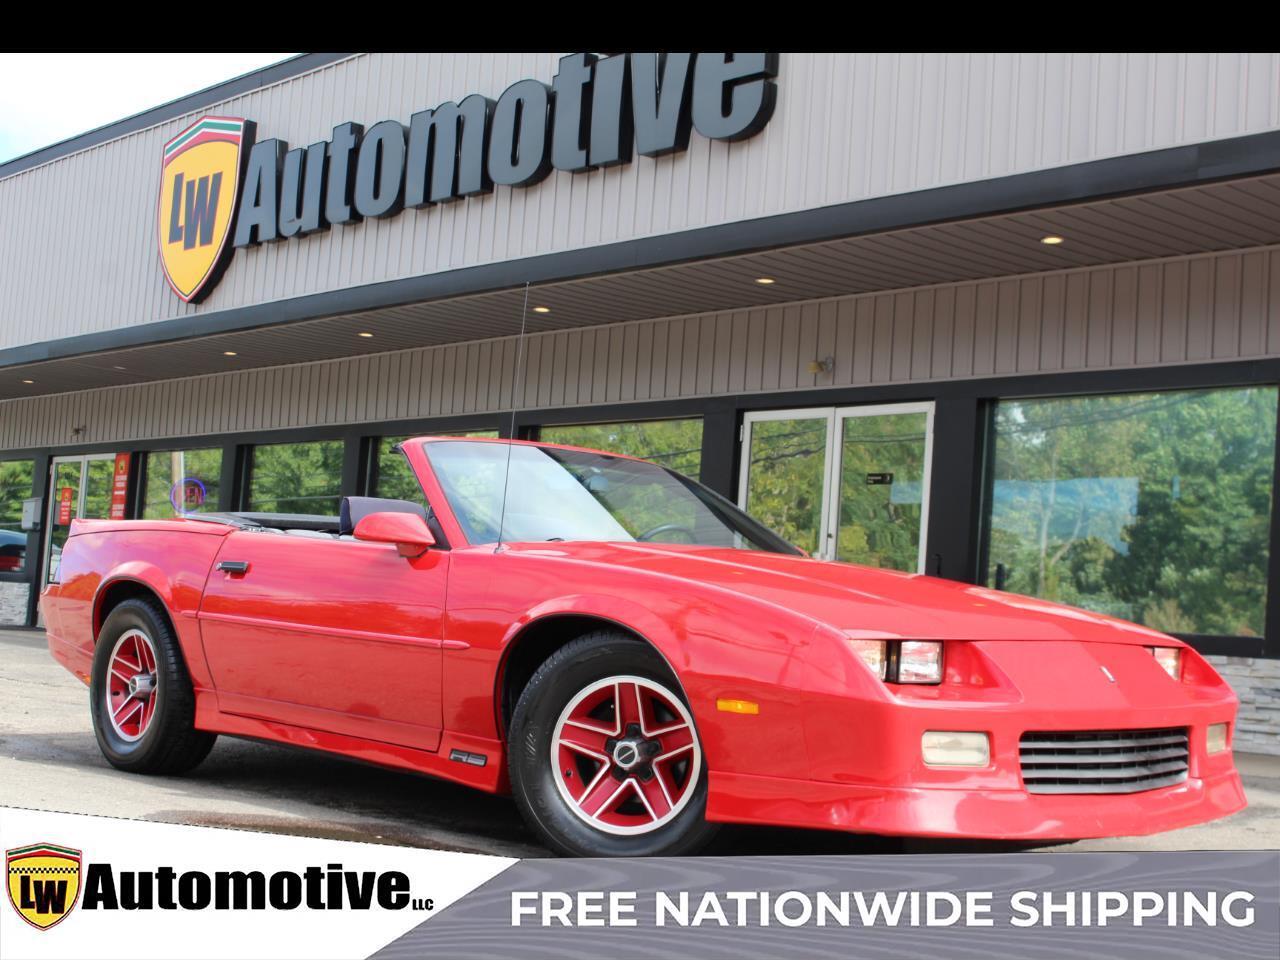 1989 Chevrolet Camaro 2dr Convertible RS